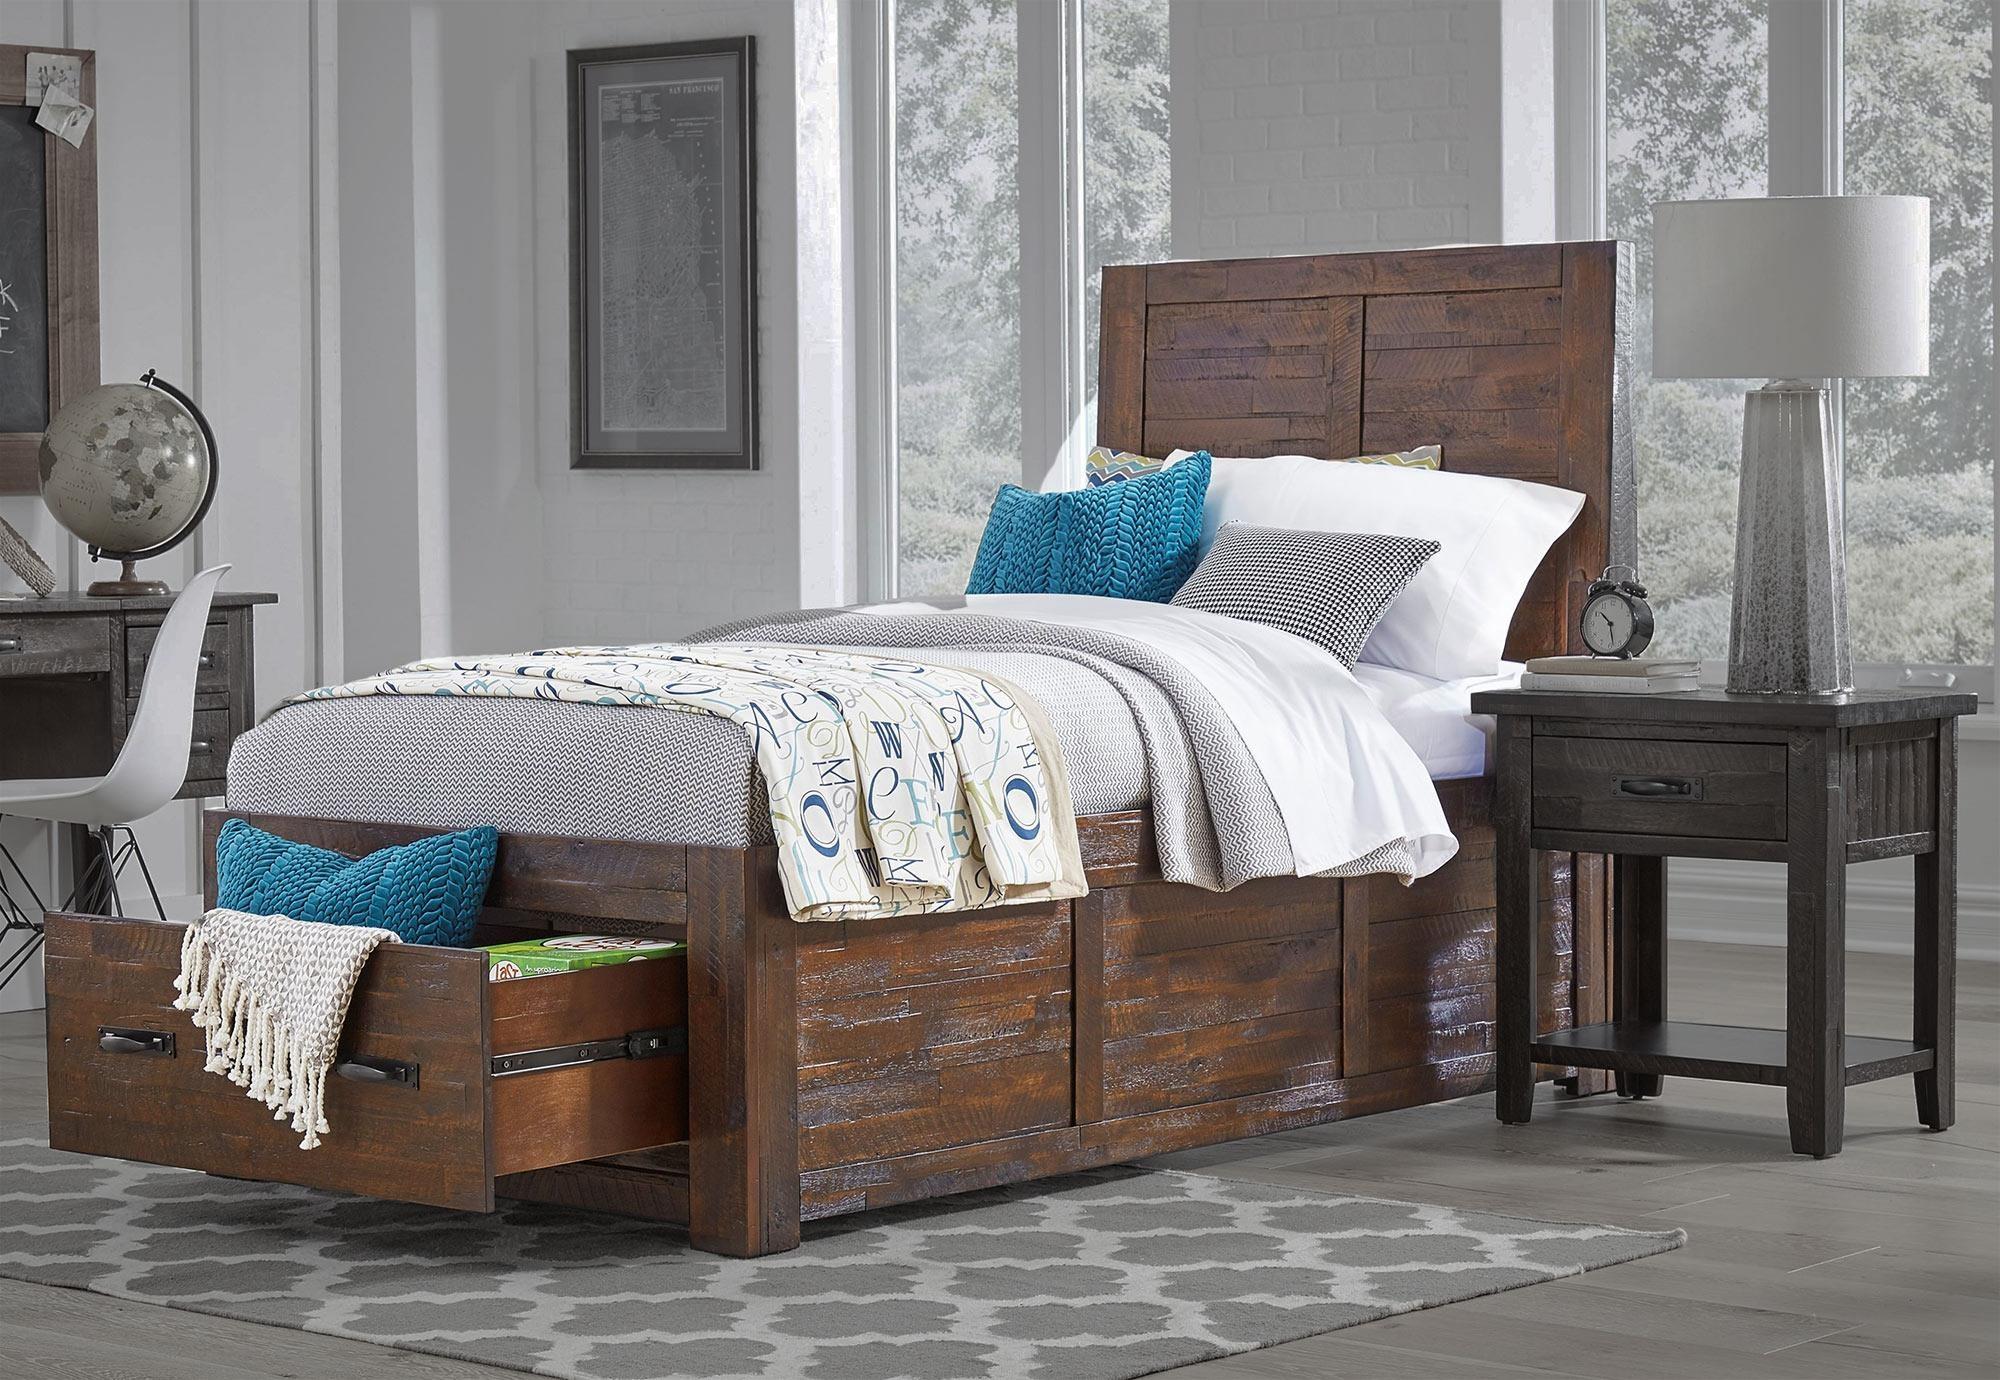 Jofran Jax Youth Twin Storage Bed - Item Number: 1605-656667KT